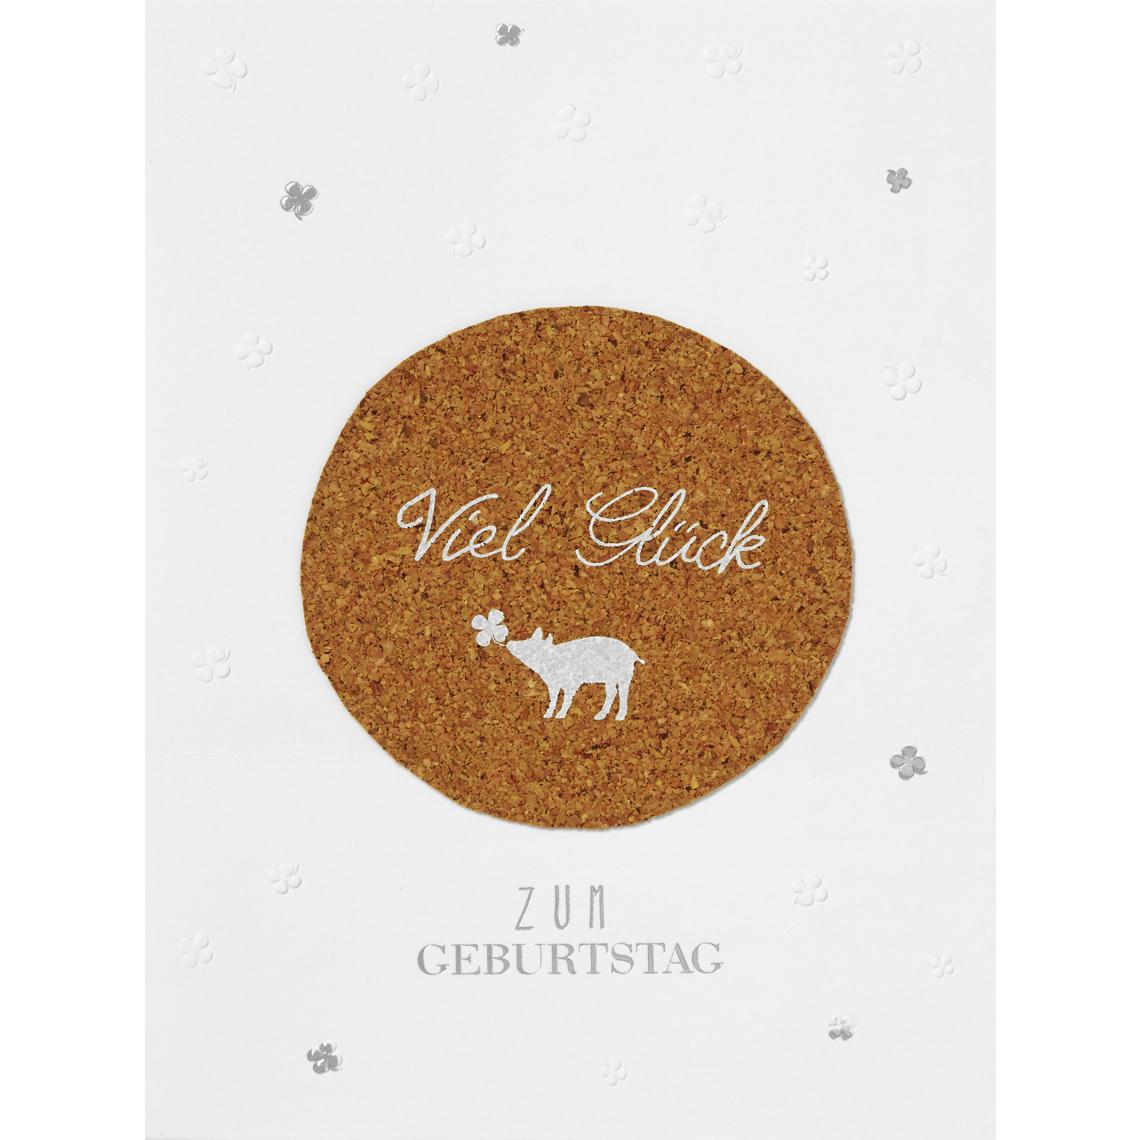 "Geburtstagskarte - Korkkarte ""Viel Glück"" - räder"